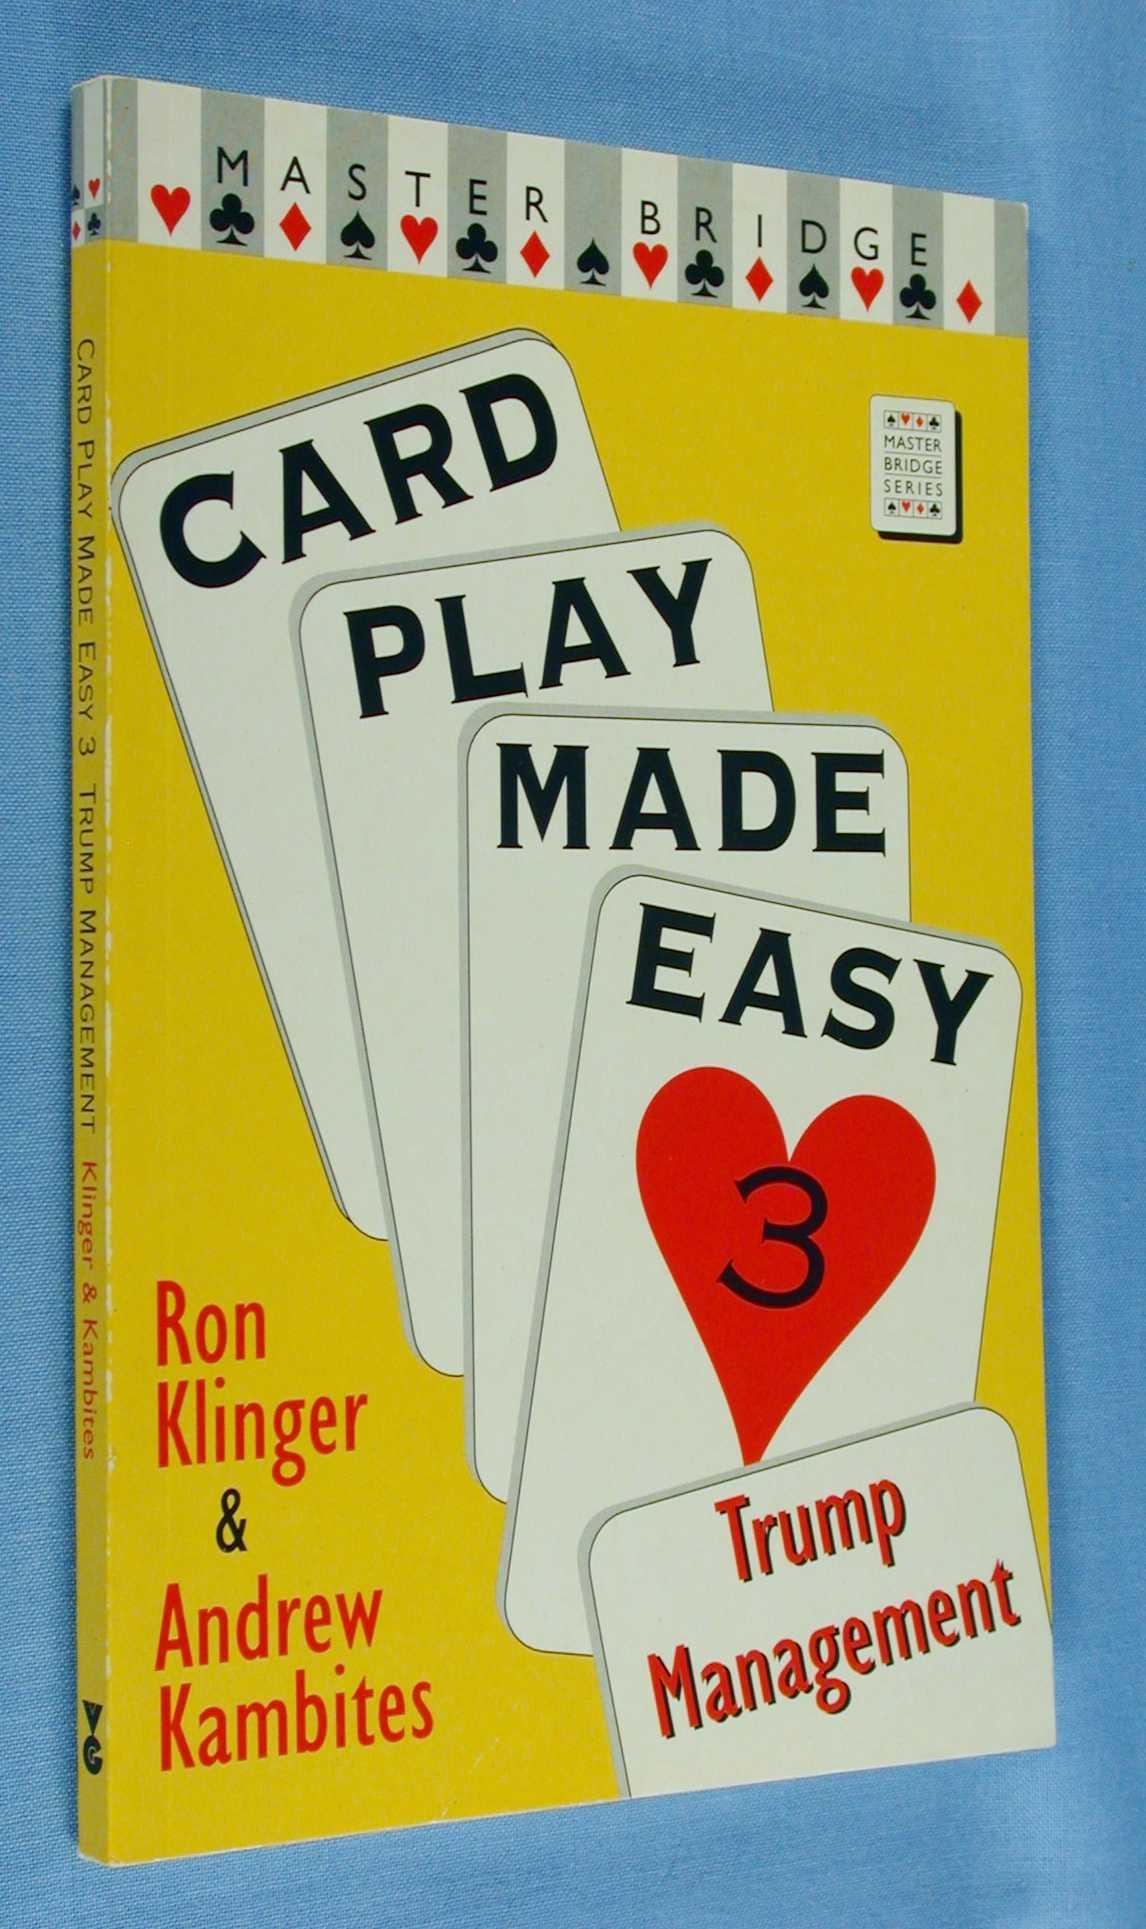 Card Play Made Easy 3 - Trump Management  (Master Bridge Series), Klinger, Ron ; Kambites, Andrew ;